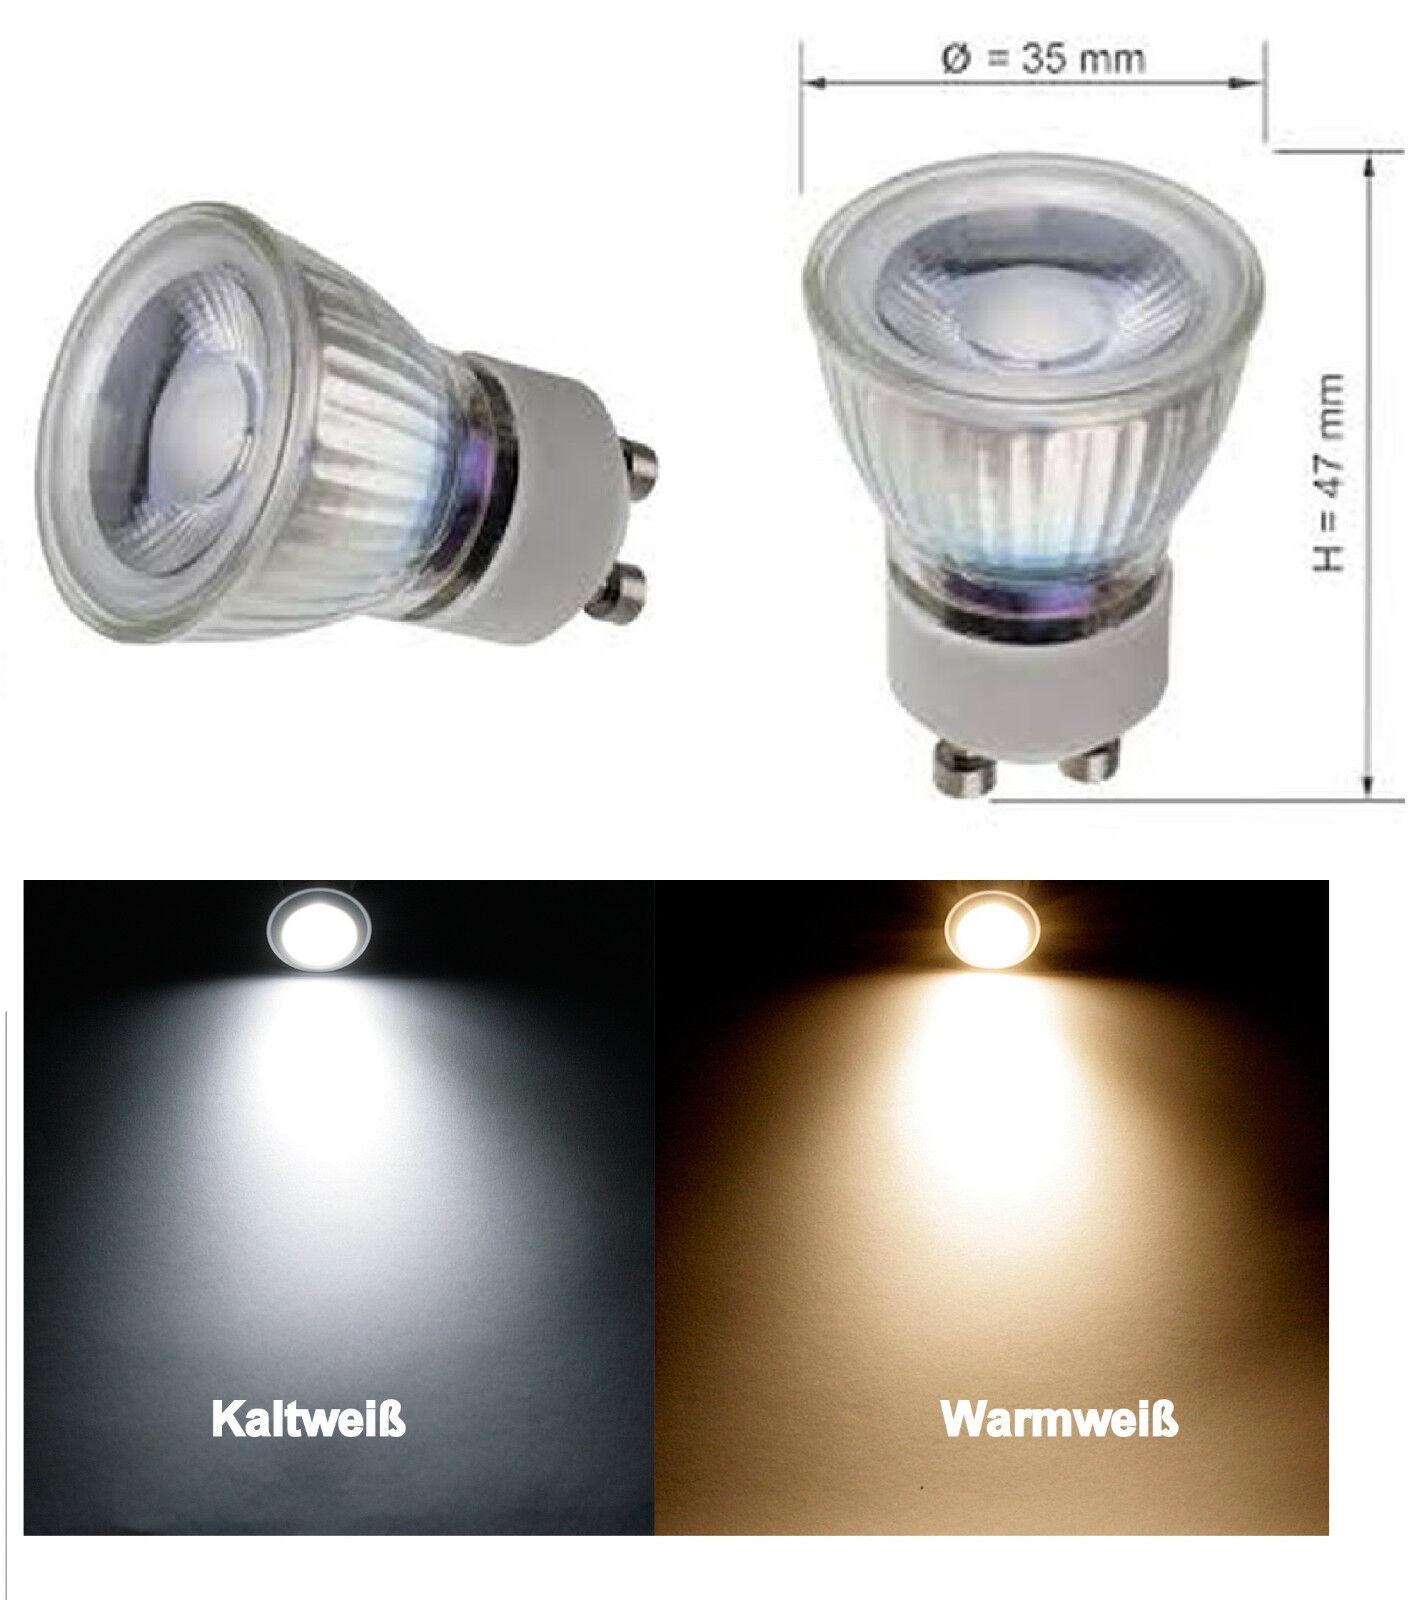 3Watt = 25 Watt LED COB MR11 230Volt GU10 Leuchtmittel EEK: A+ Reflektor 35mm